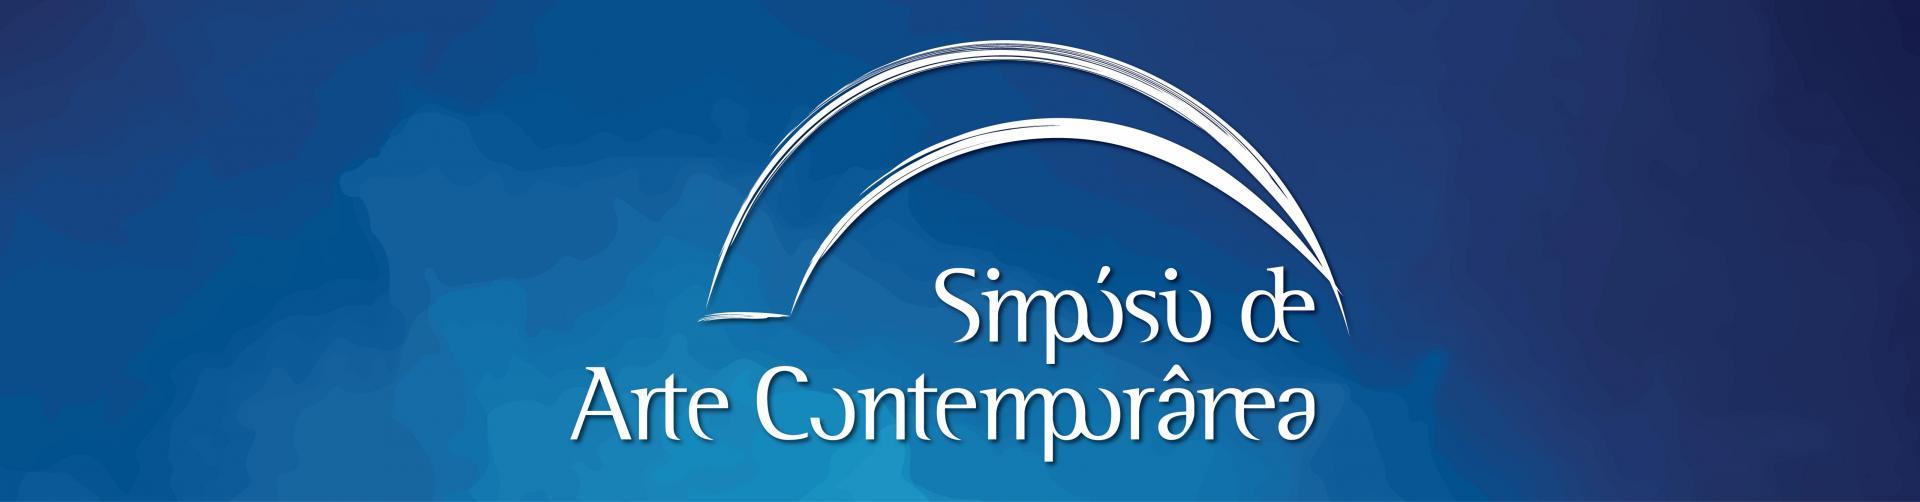 LABART_SIMPOSIO-DE-ARTE-CONTEMPORANEA